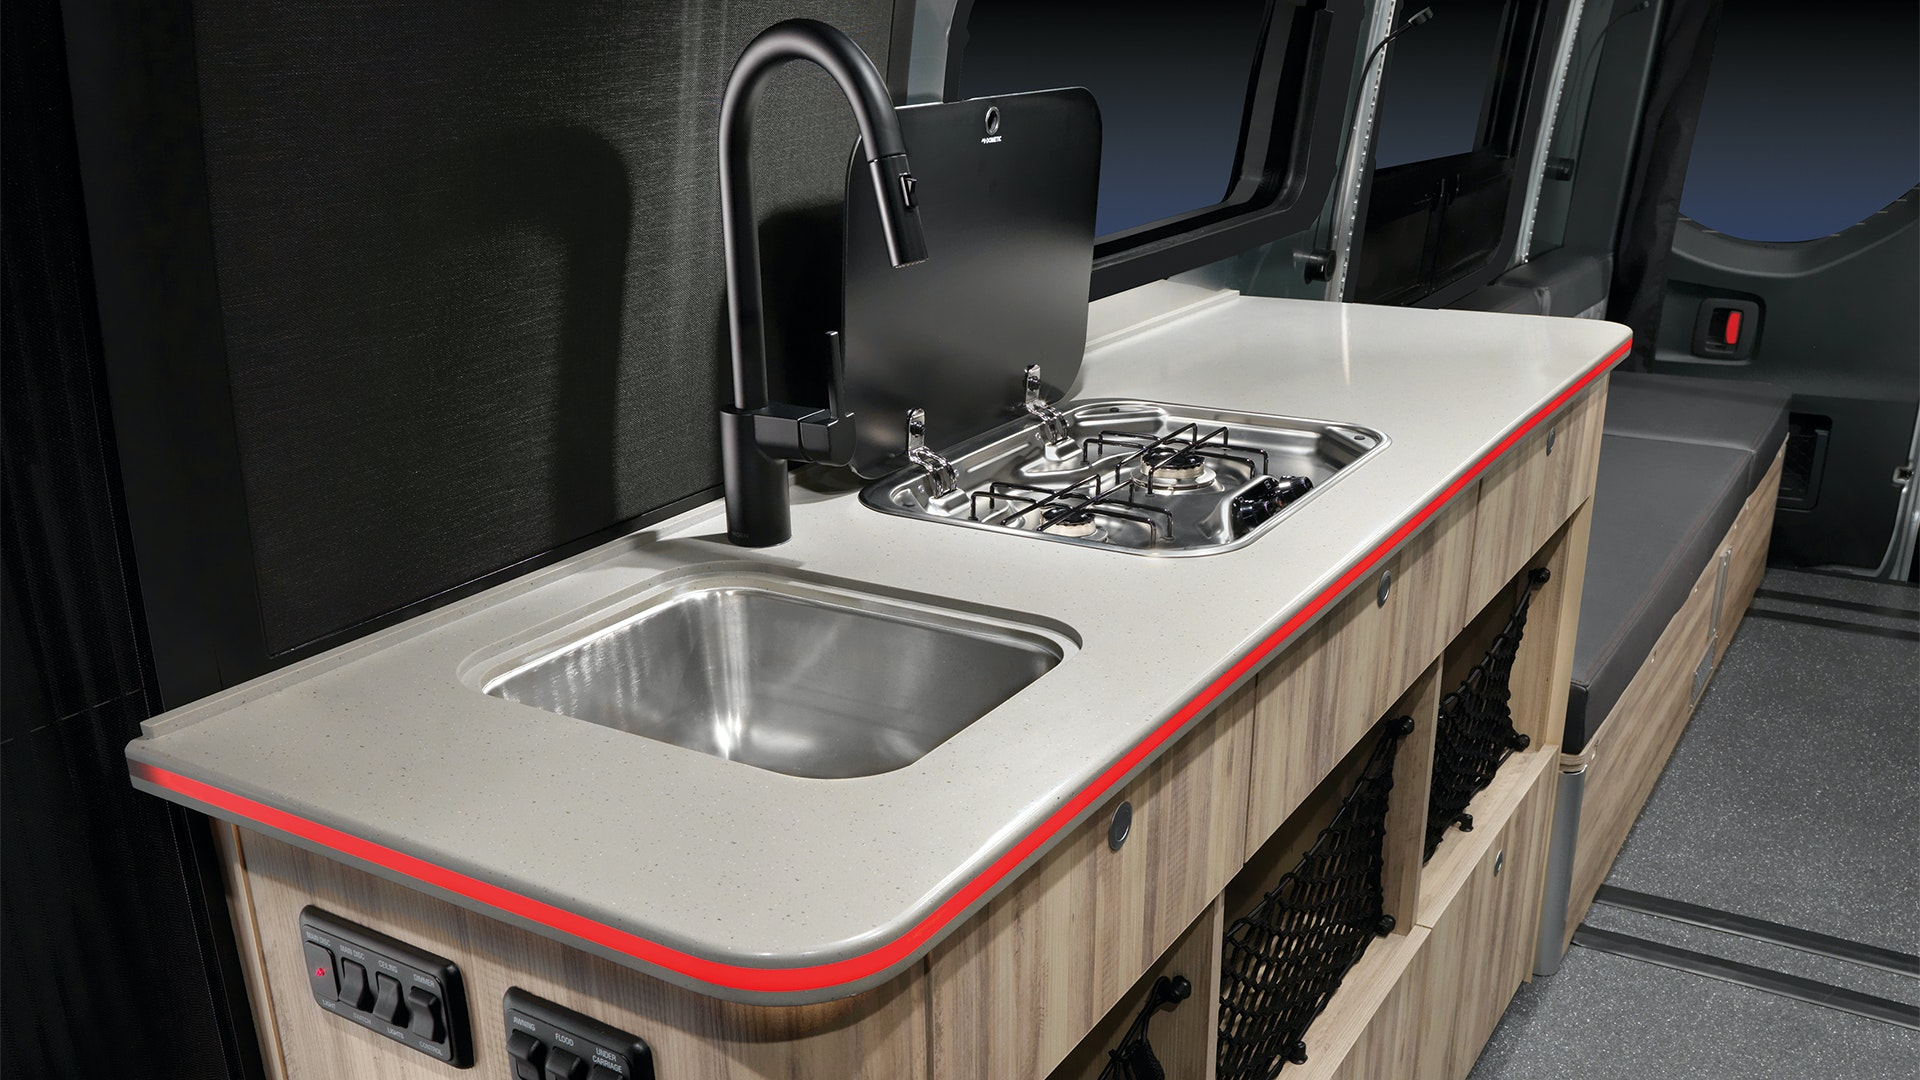 Airstream-Interstate-24X-Interior-Kitchen-Space-Class-B-Adventure-Van-8679qwpod1